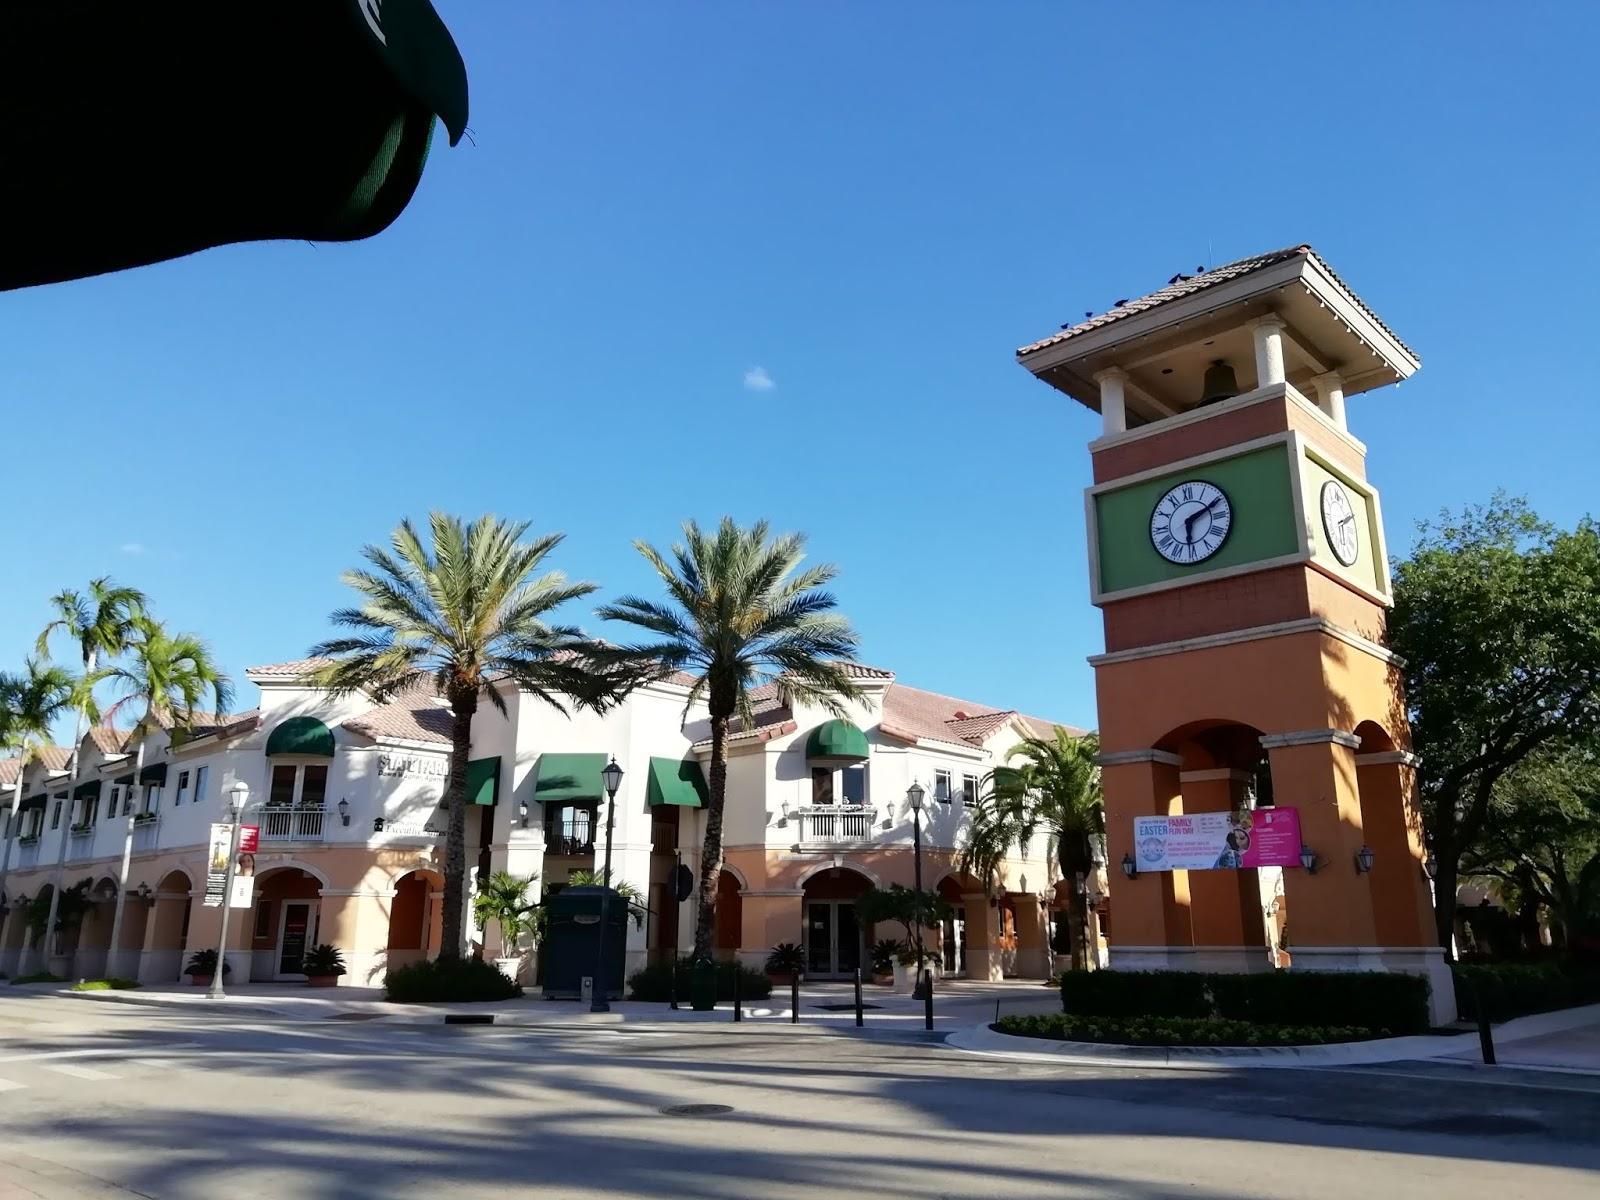 Weston Town Center